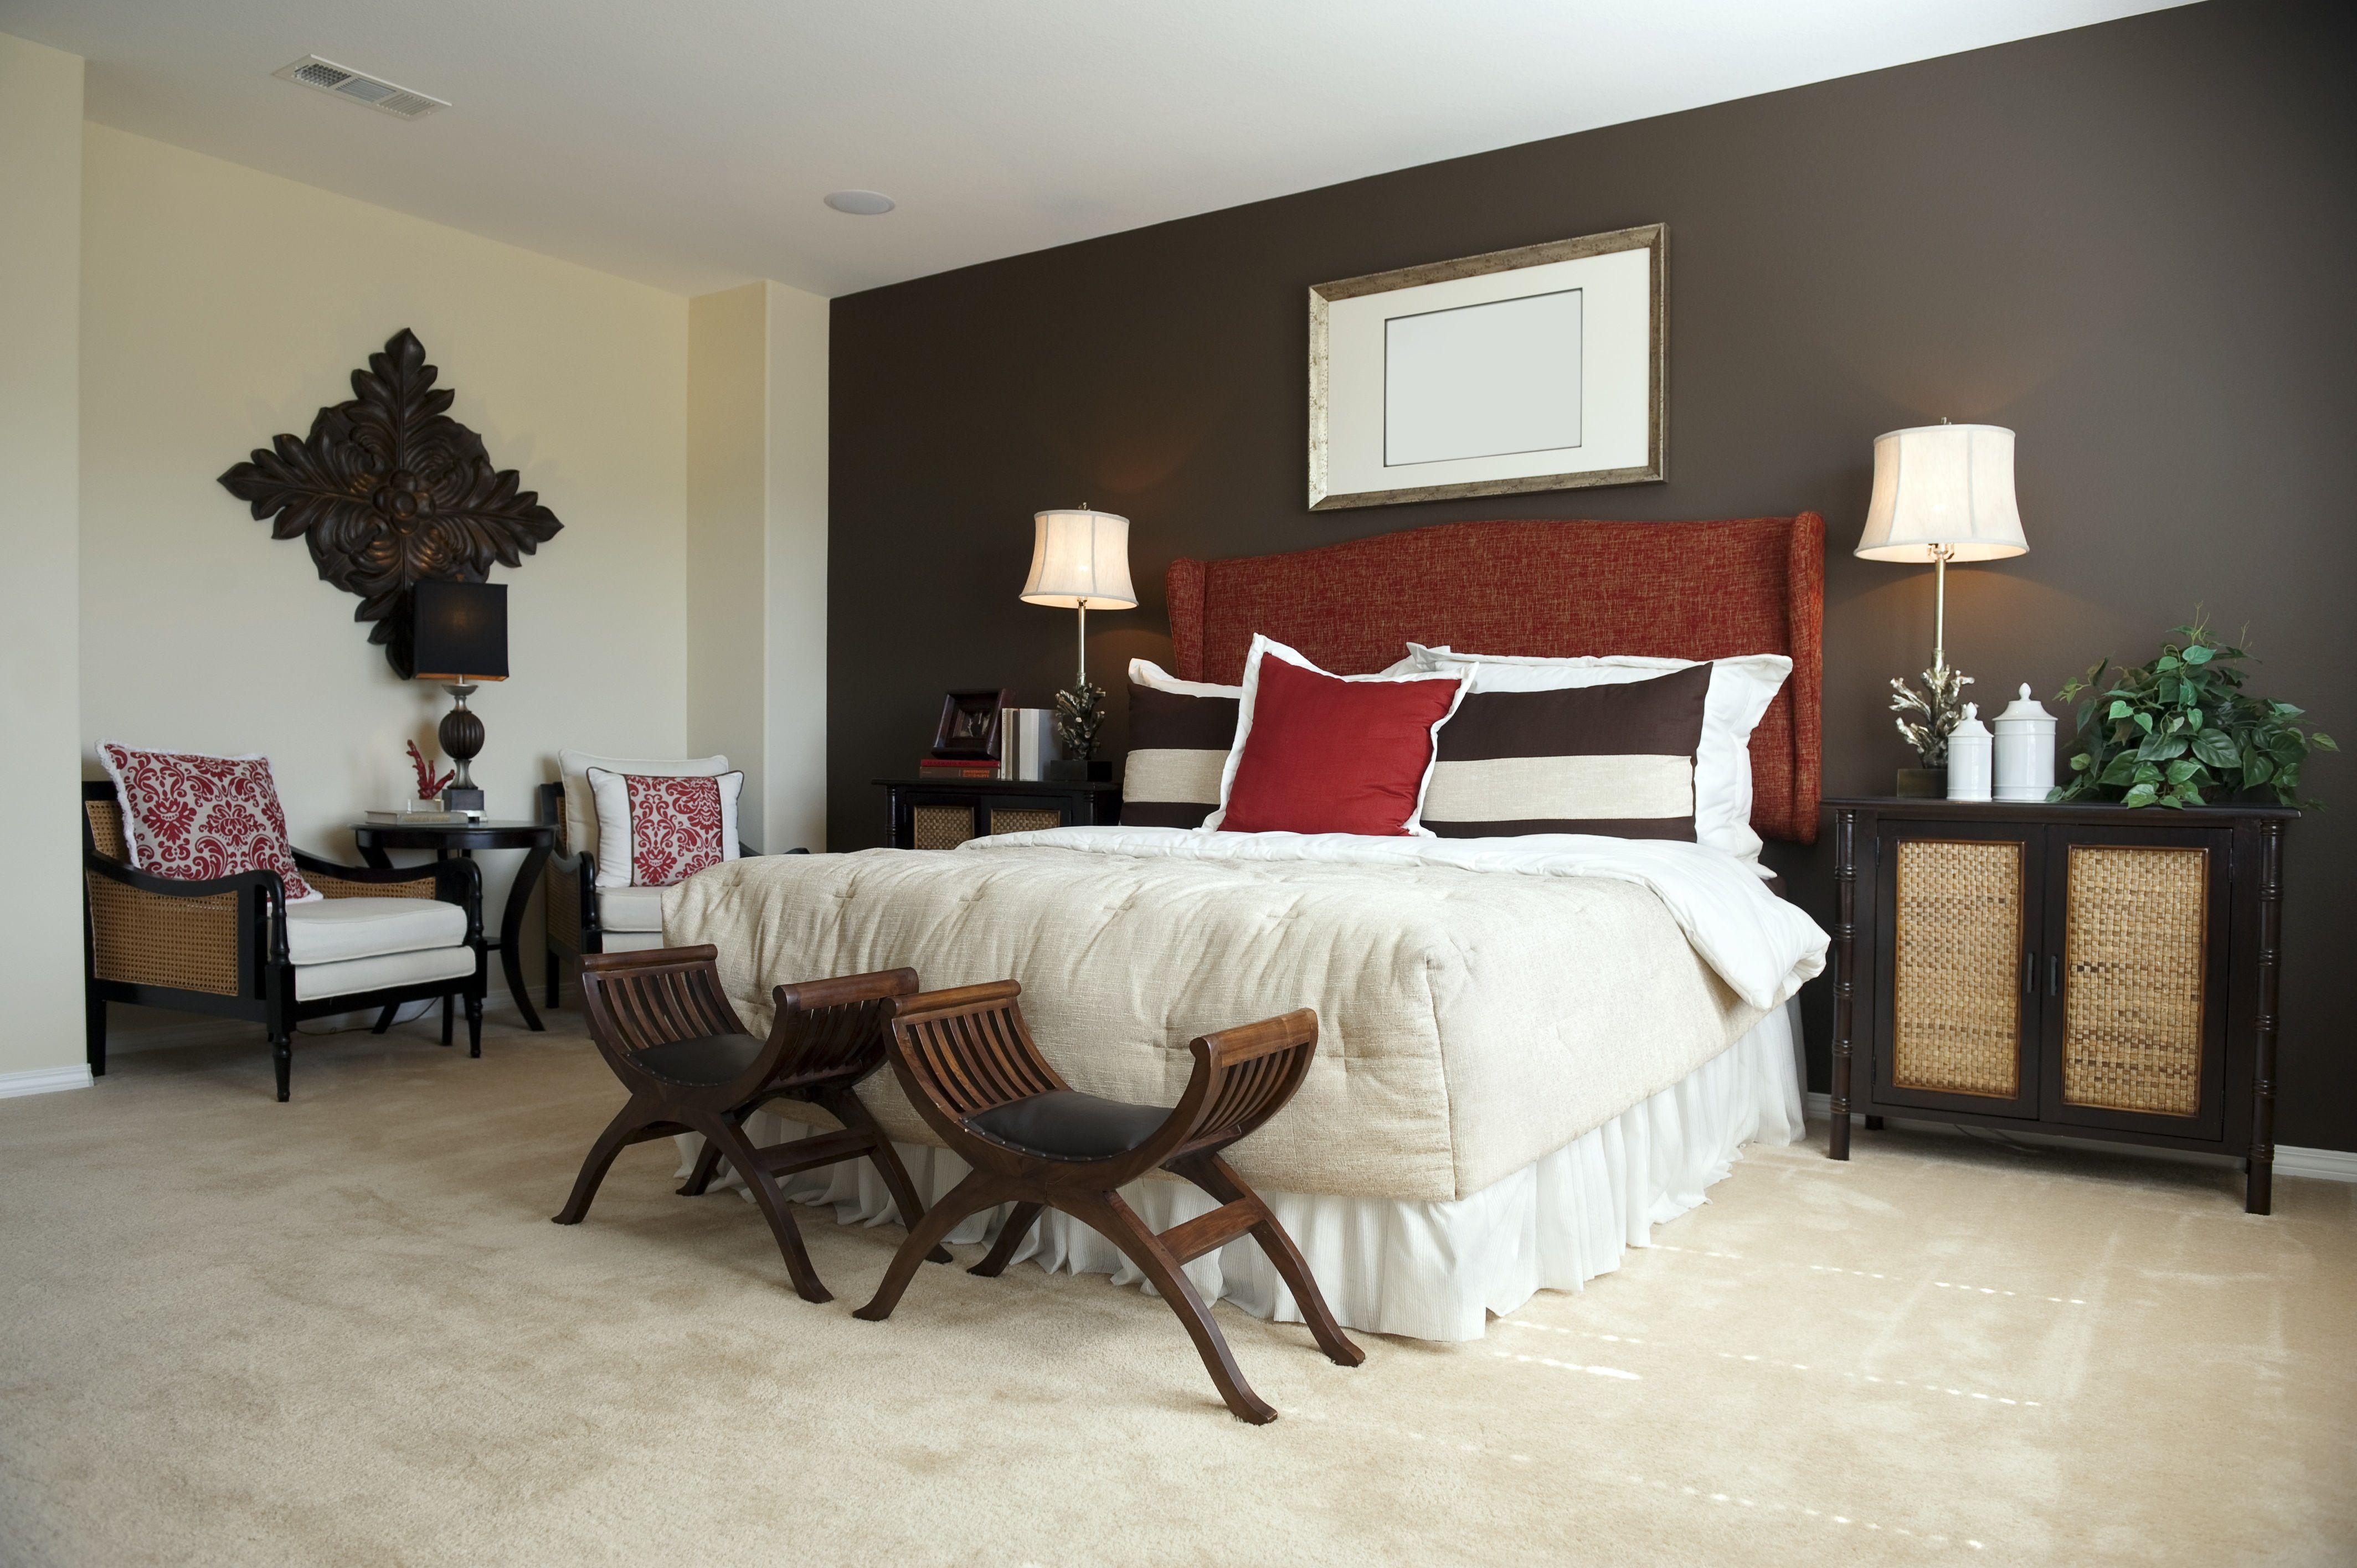 animation furniture com home kitchenagenda of video interior explainer bedroom pic design